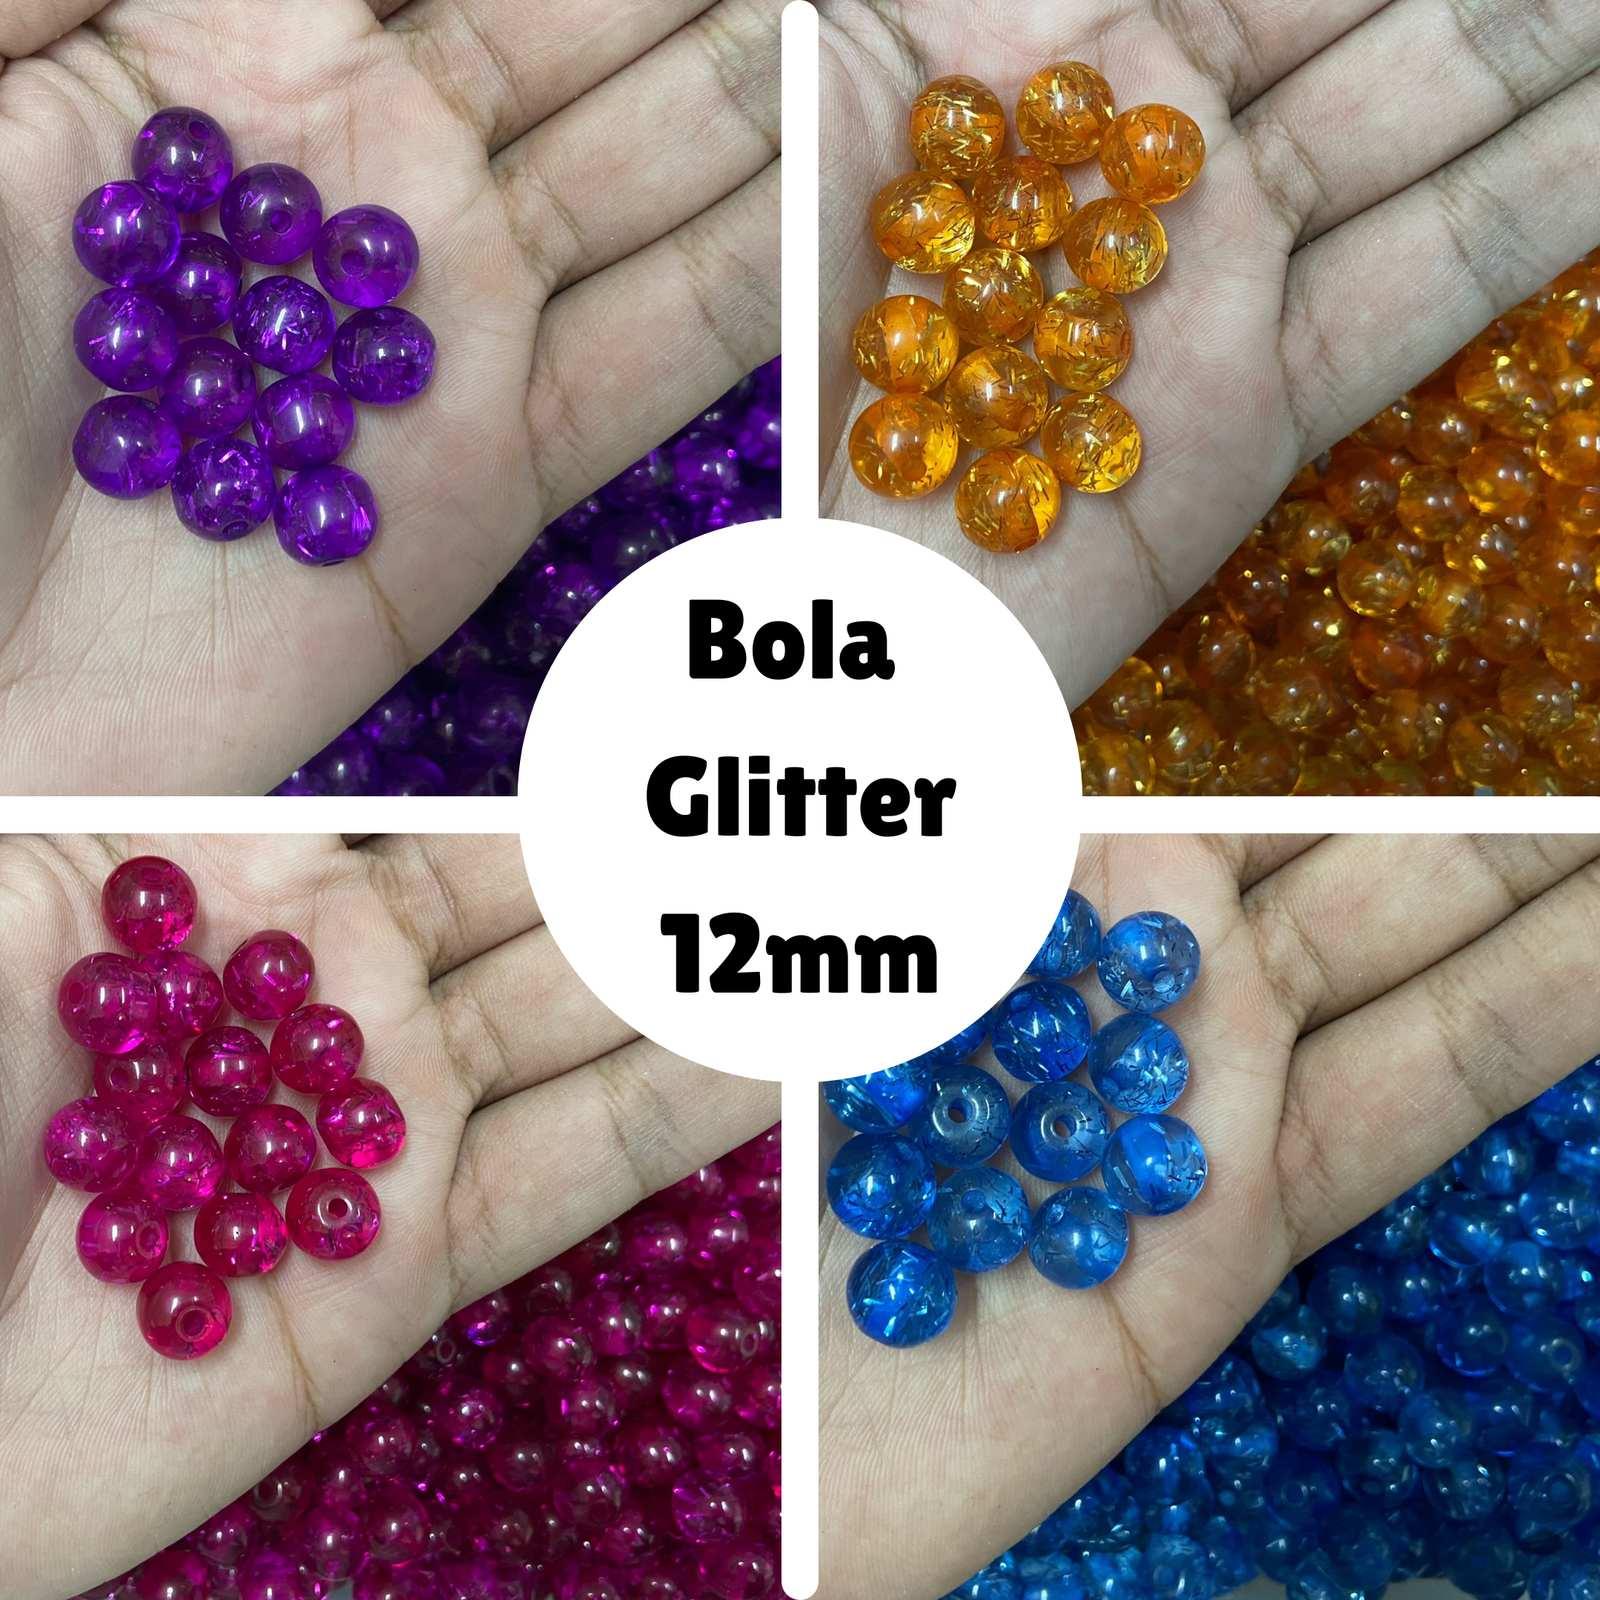 Bola Glitter 12mm - 500g